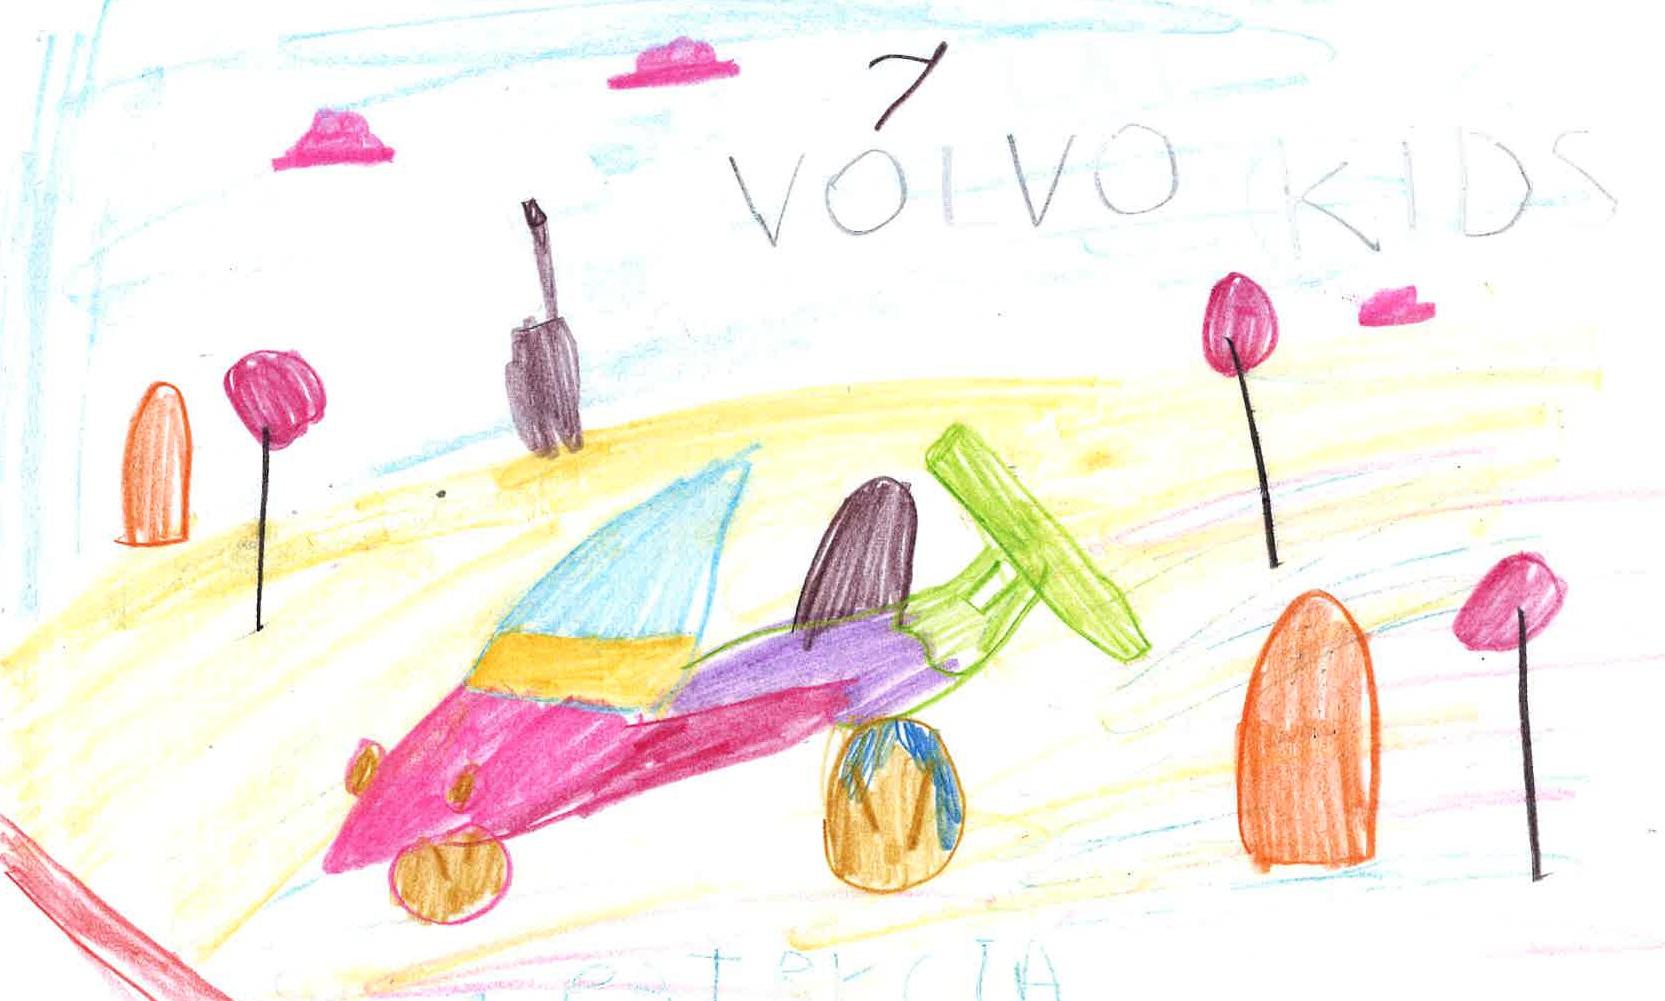 volvo-kids3